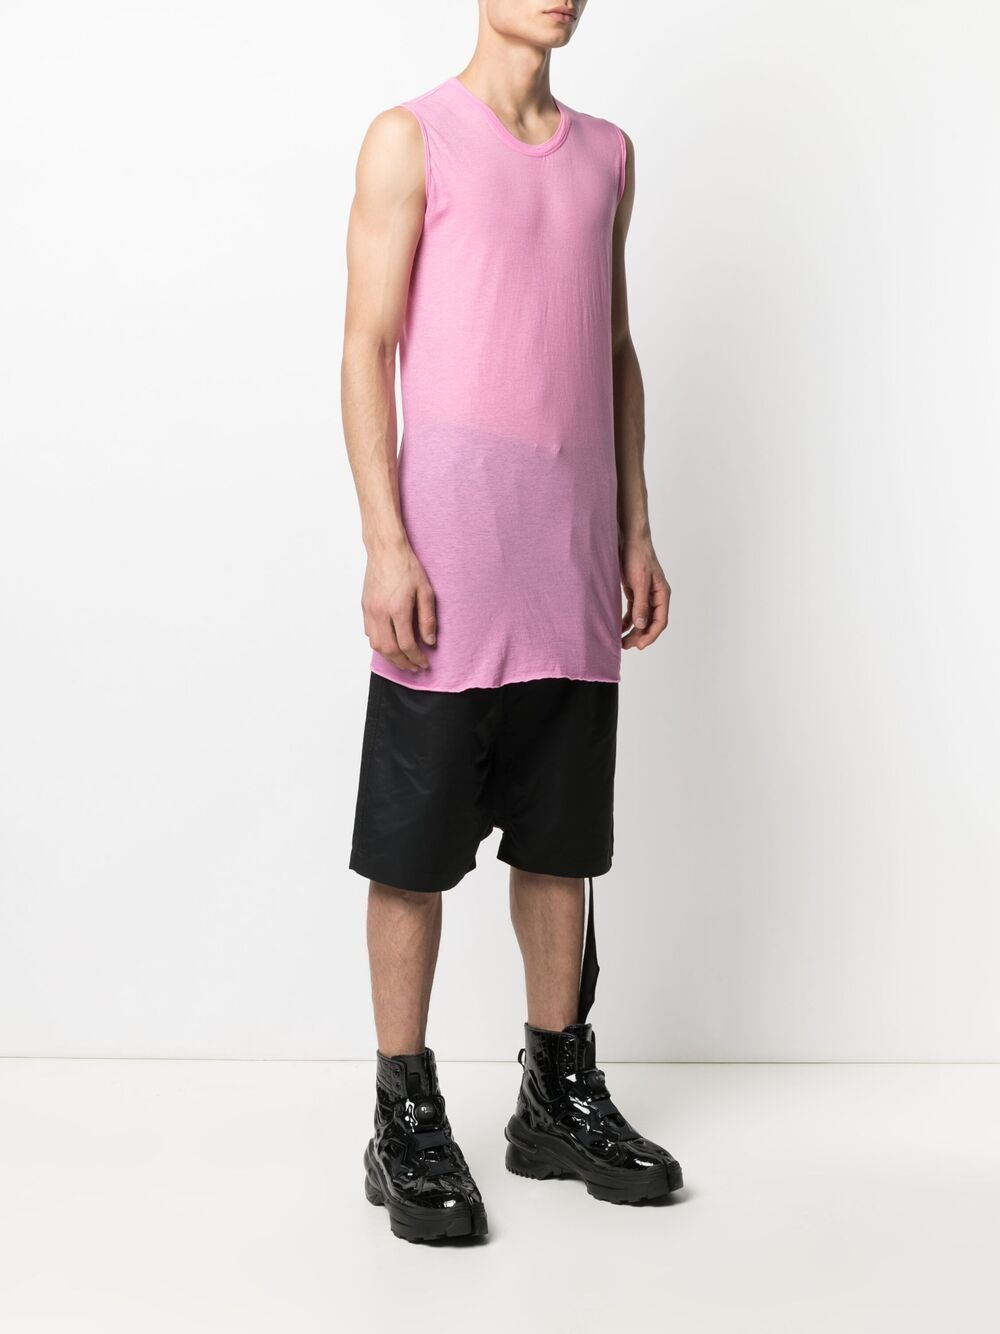 ELONGATED TANK TOP RICK OWENS | T-shirts | RU21S6151 UC183